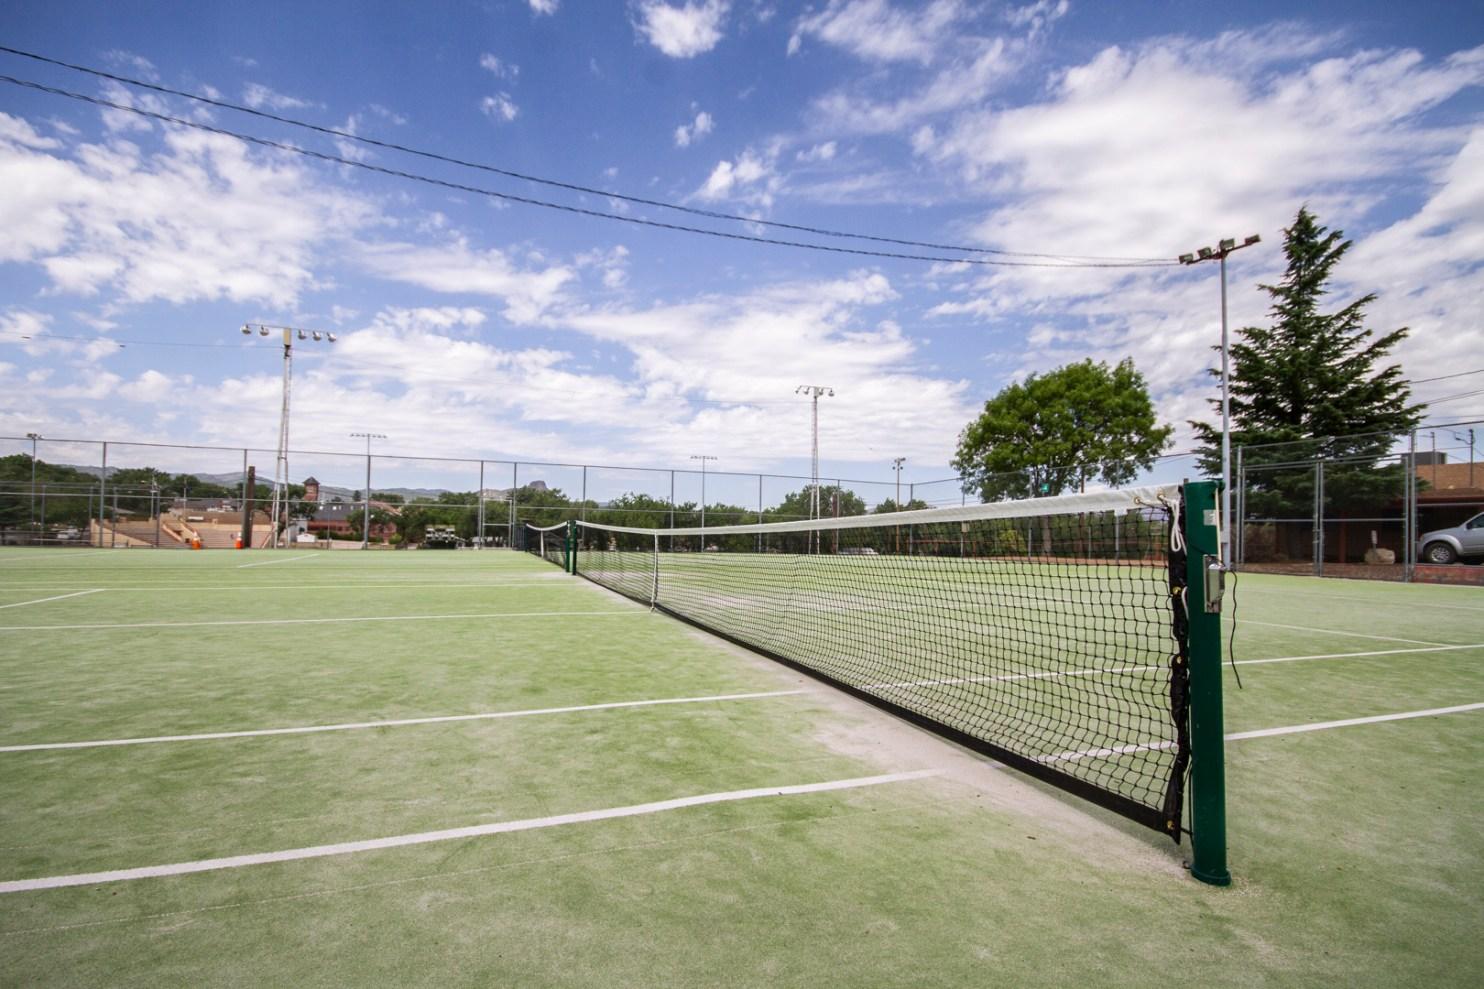 visit prescott, prescott parks, tennis in prescott, public park